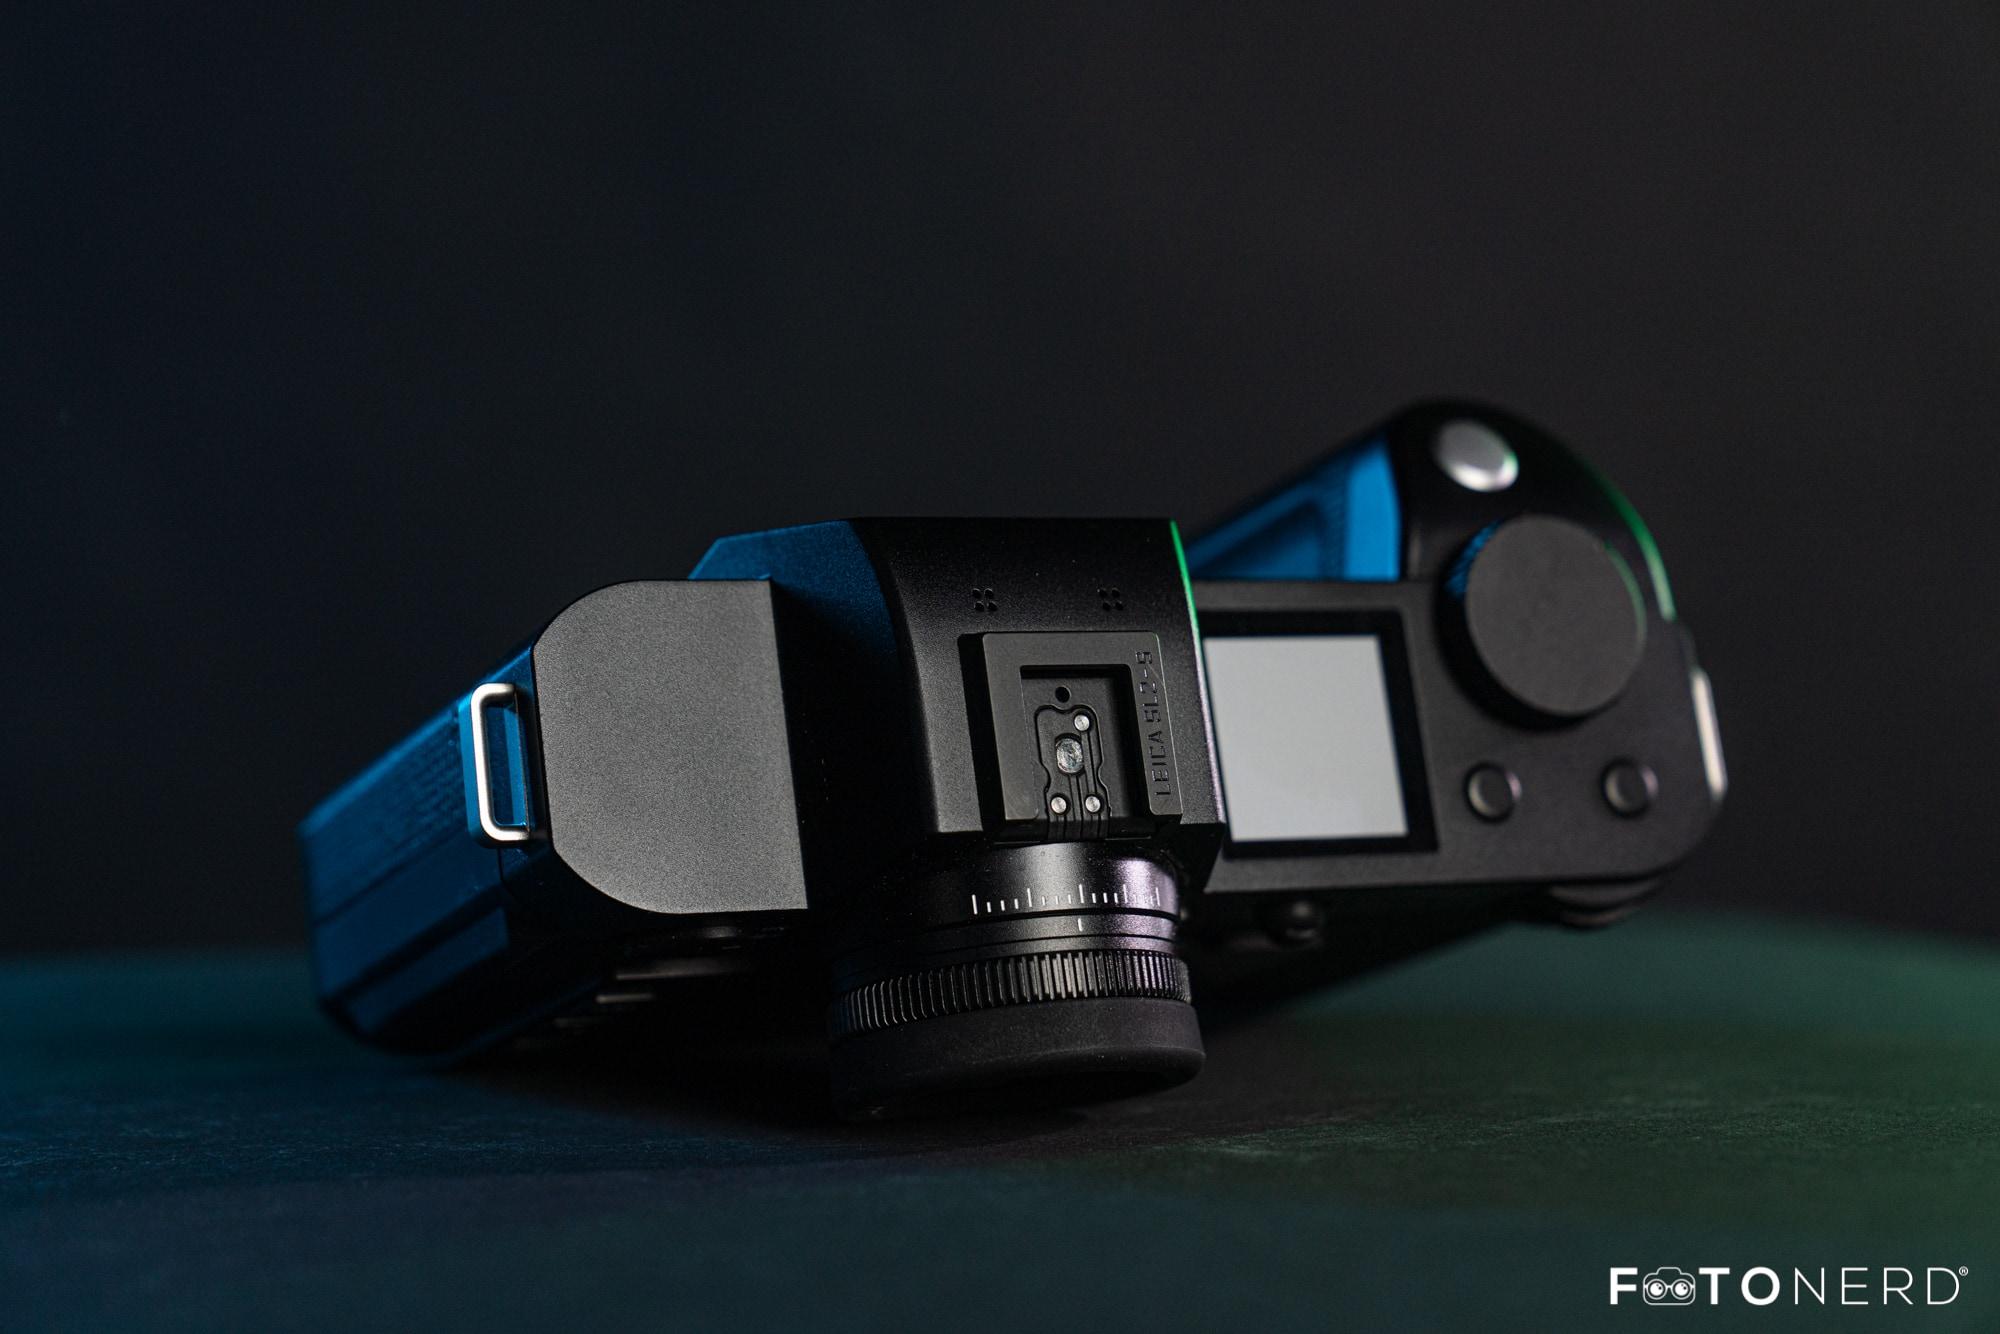 Leica SL2-S firmware 2.0